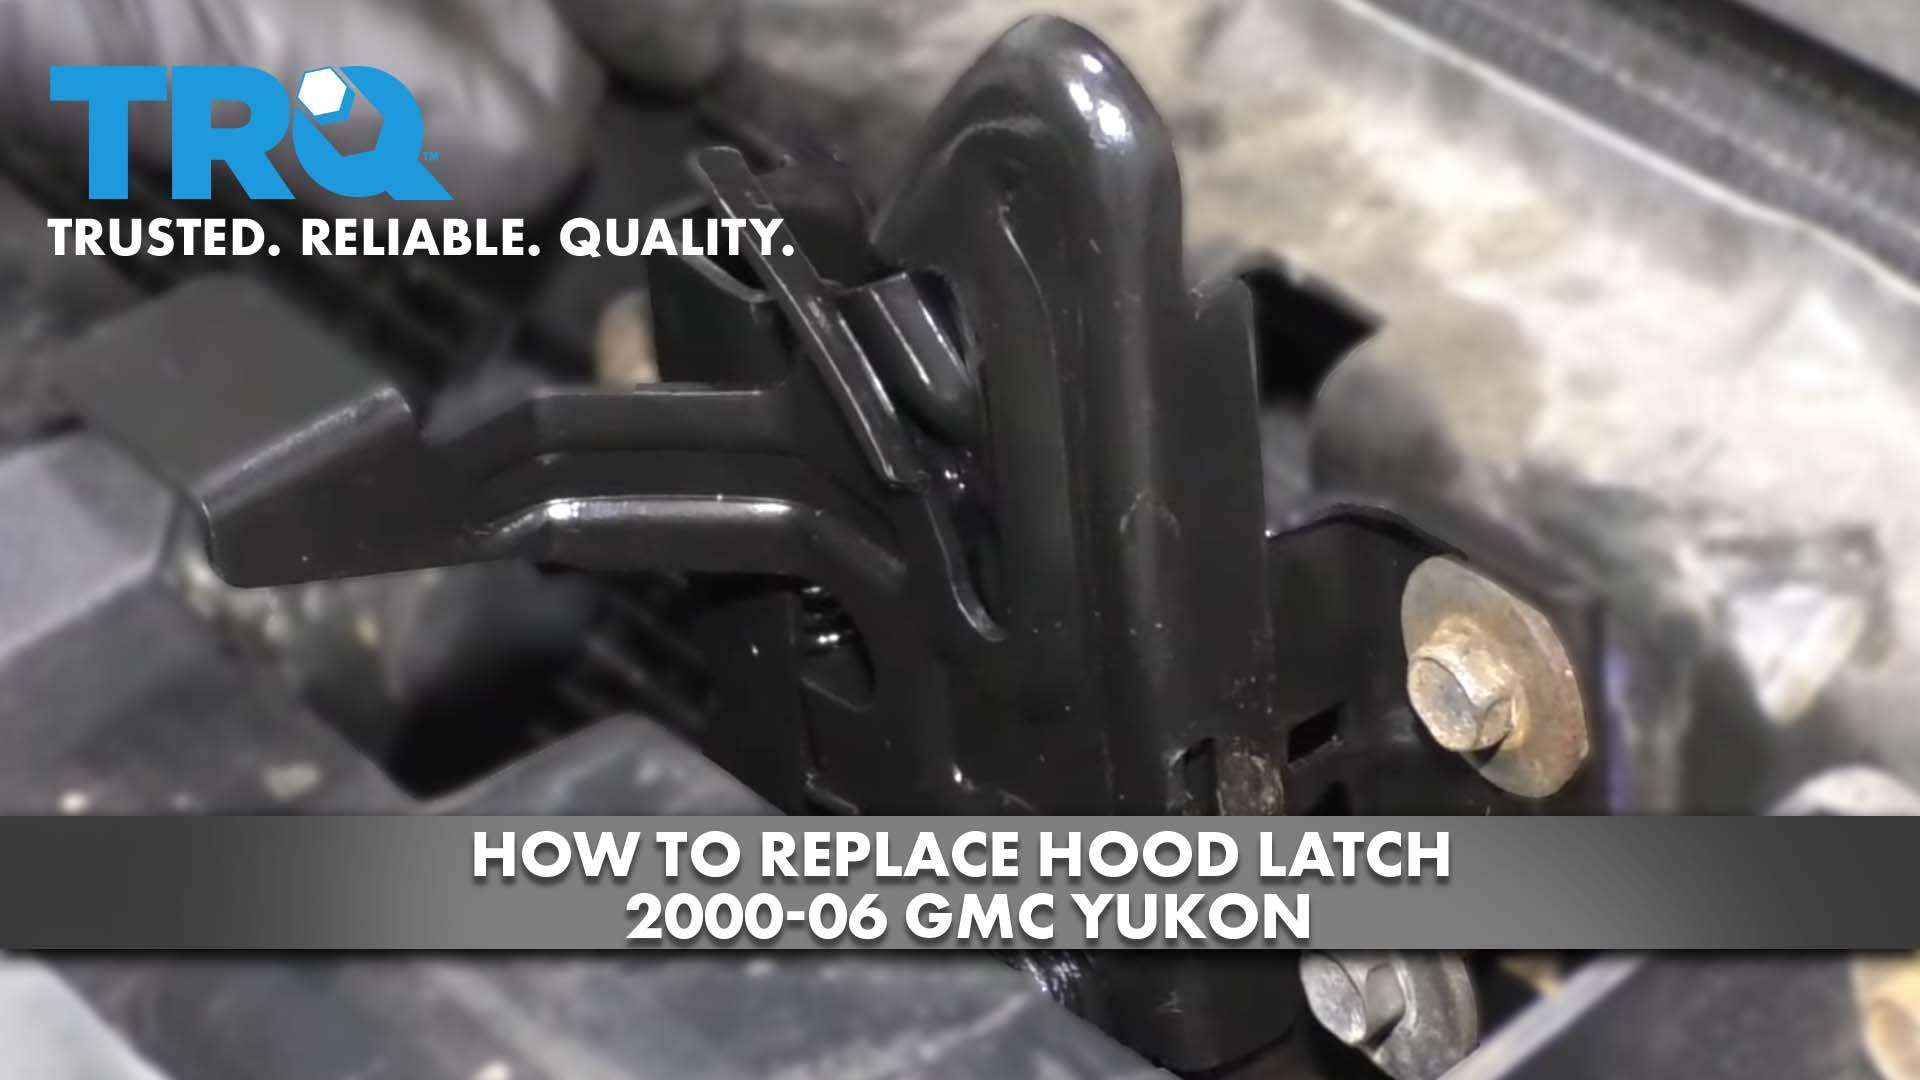 How to Replace Hood Latch 2000-06 GMC Yukon